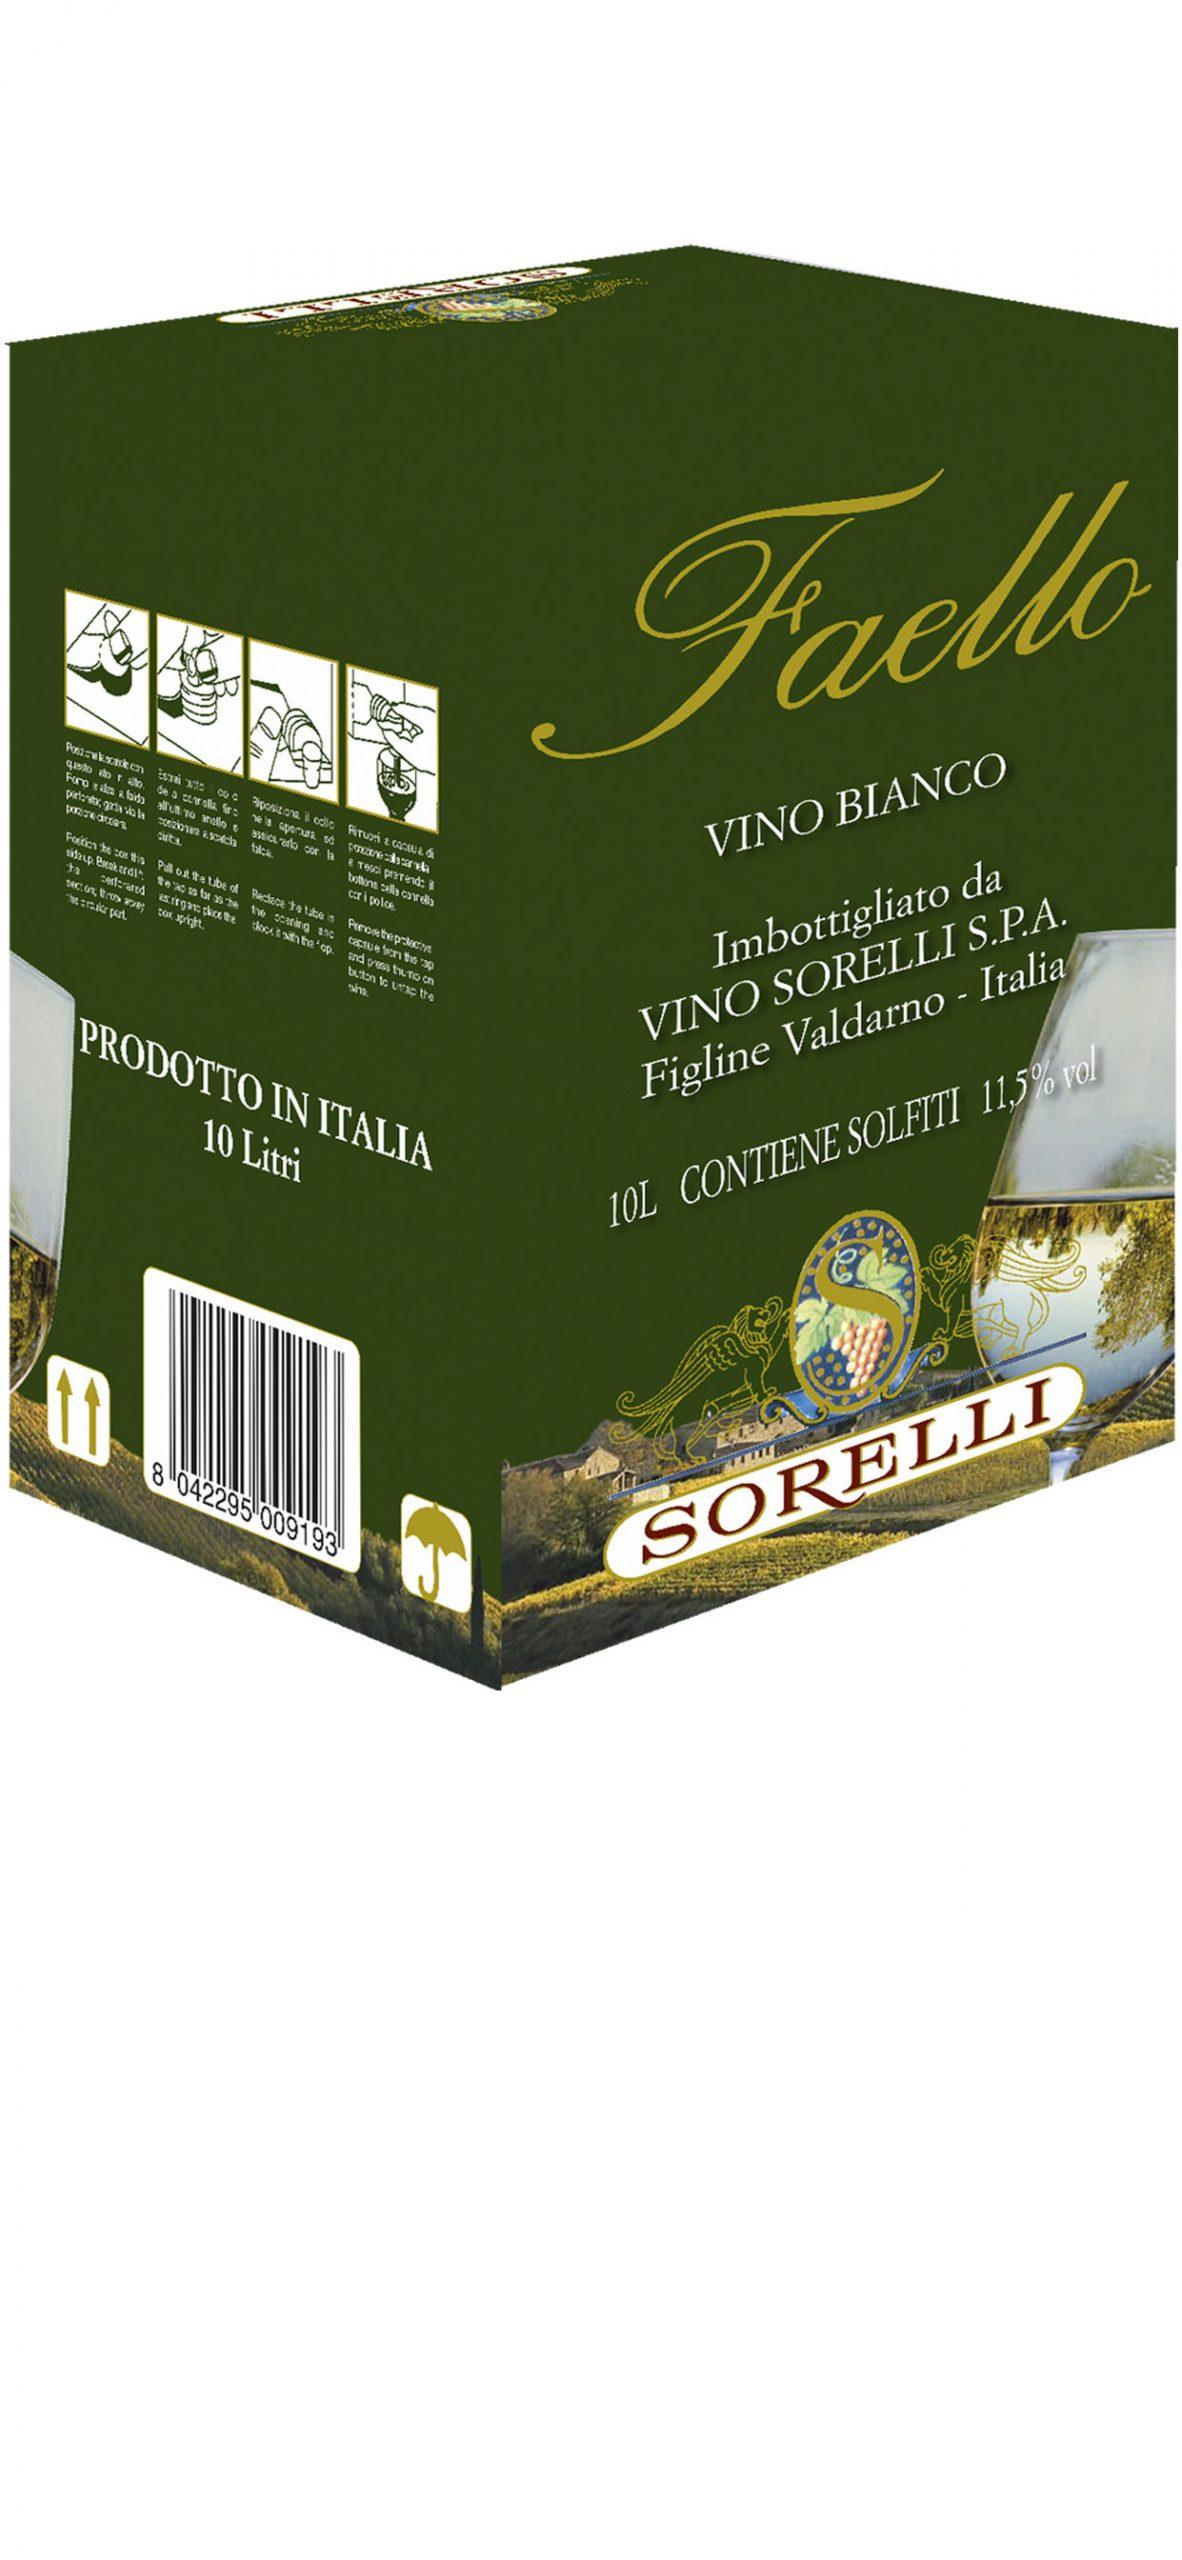 Bag Vino Bianco